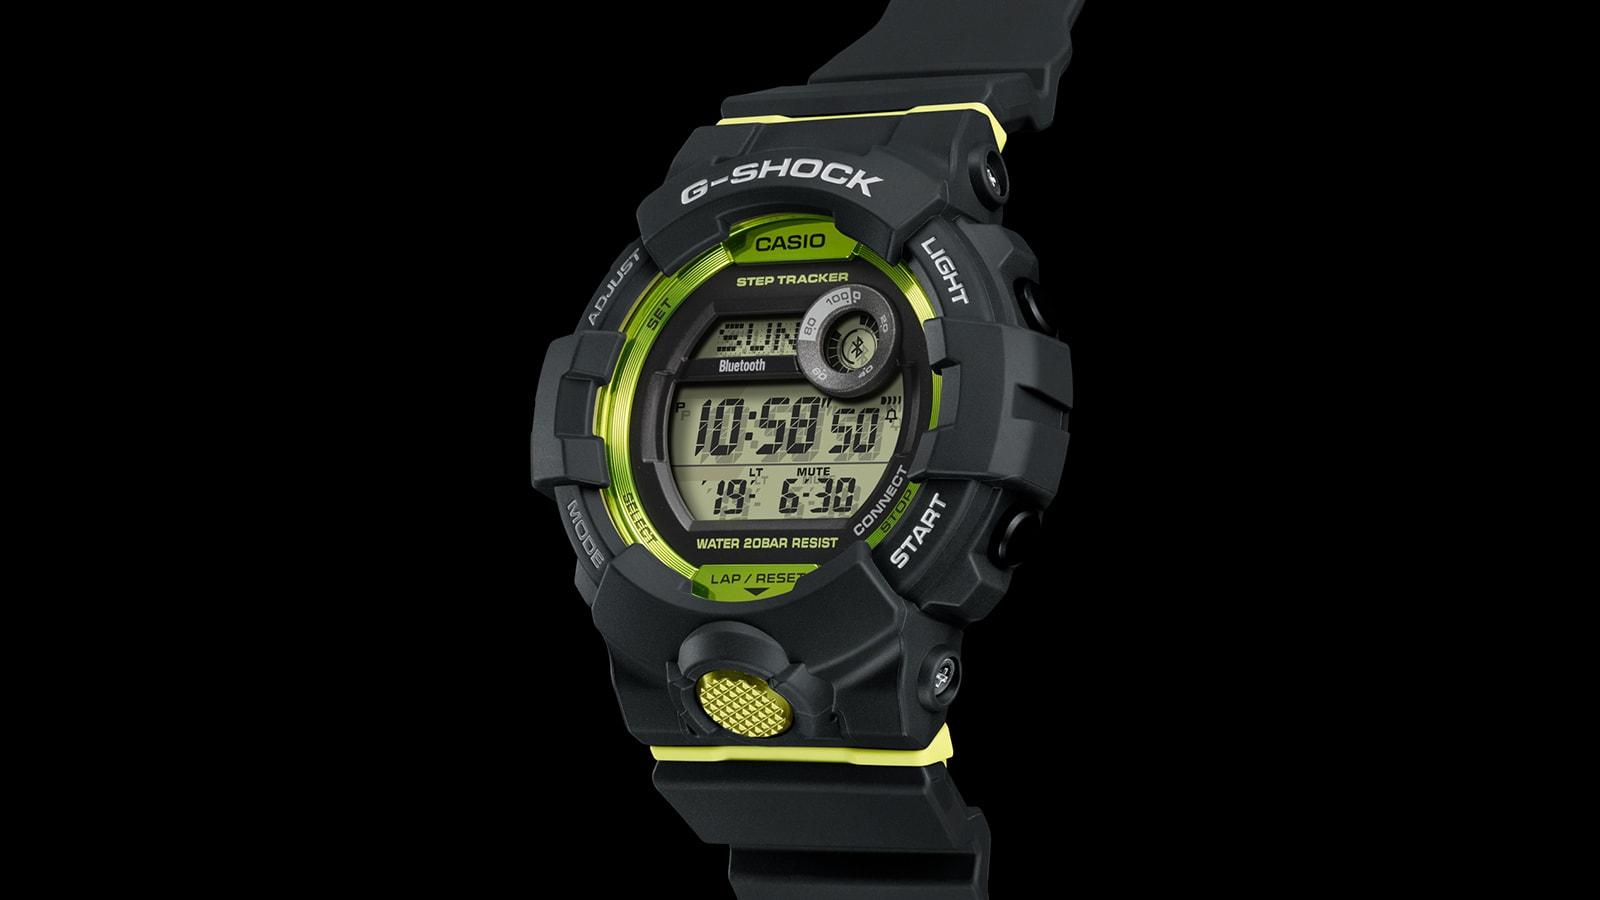 f81410a7ce G-SQUAD - GBA-800 - Bluetooth®+3軸加速度センサー搭載搭載 - 製品情報 ...